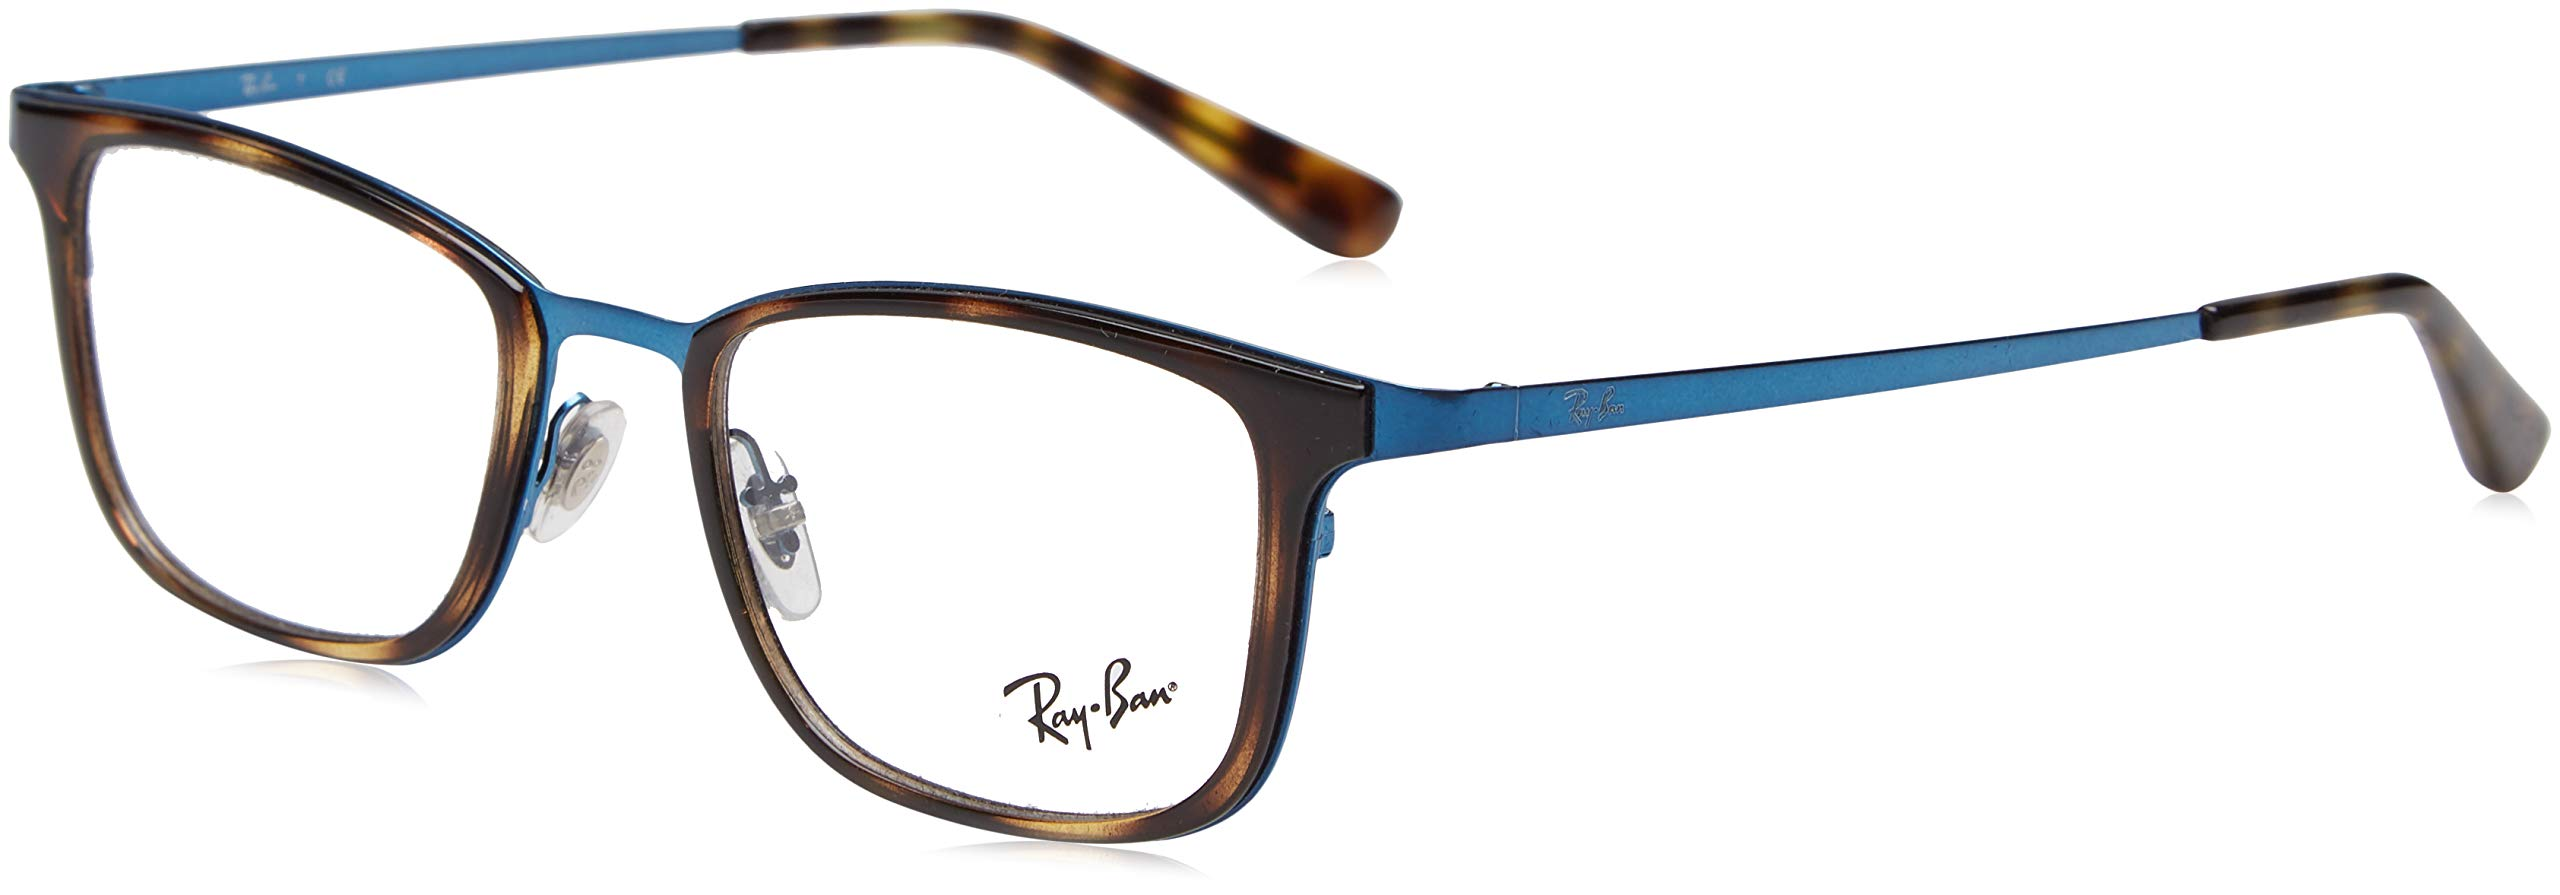 Ray ban 2924 52 SoleilBleubrushed De 6373m BlueHomme Lunettes 0rx rCthdQs